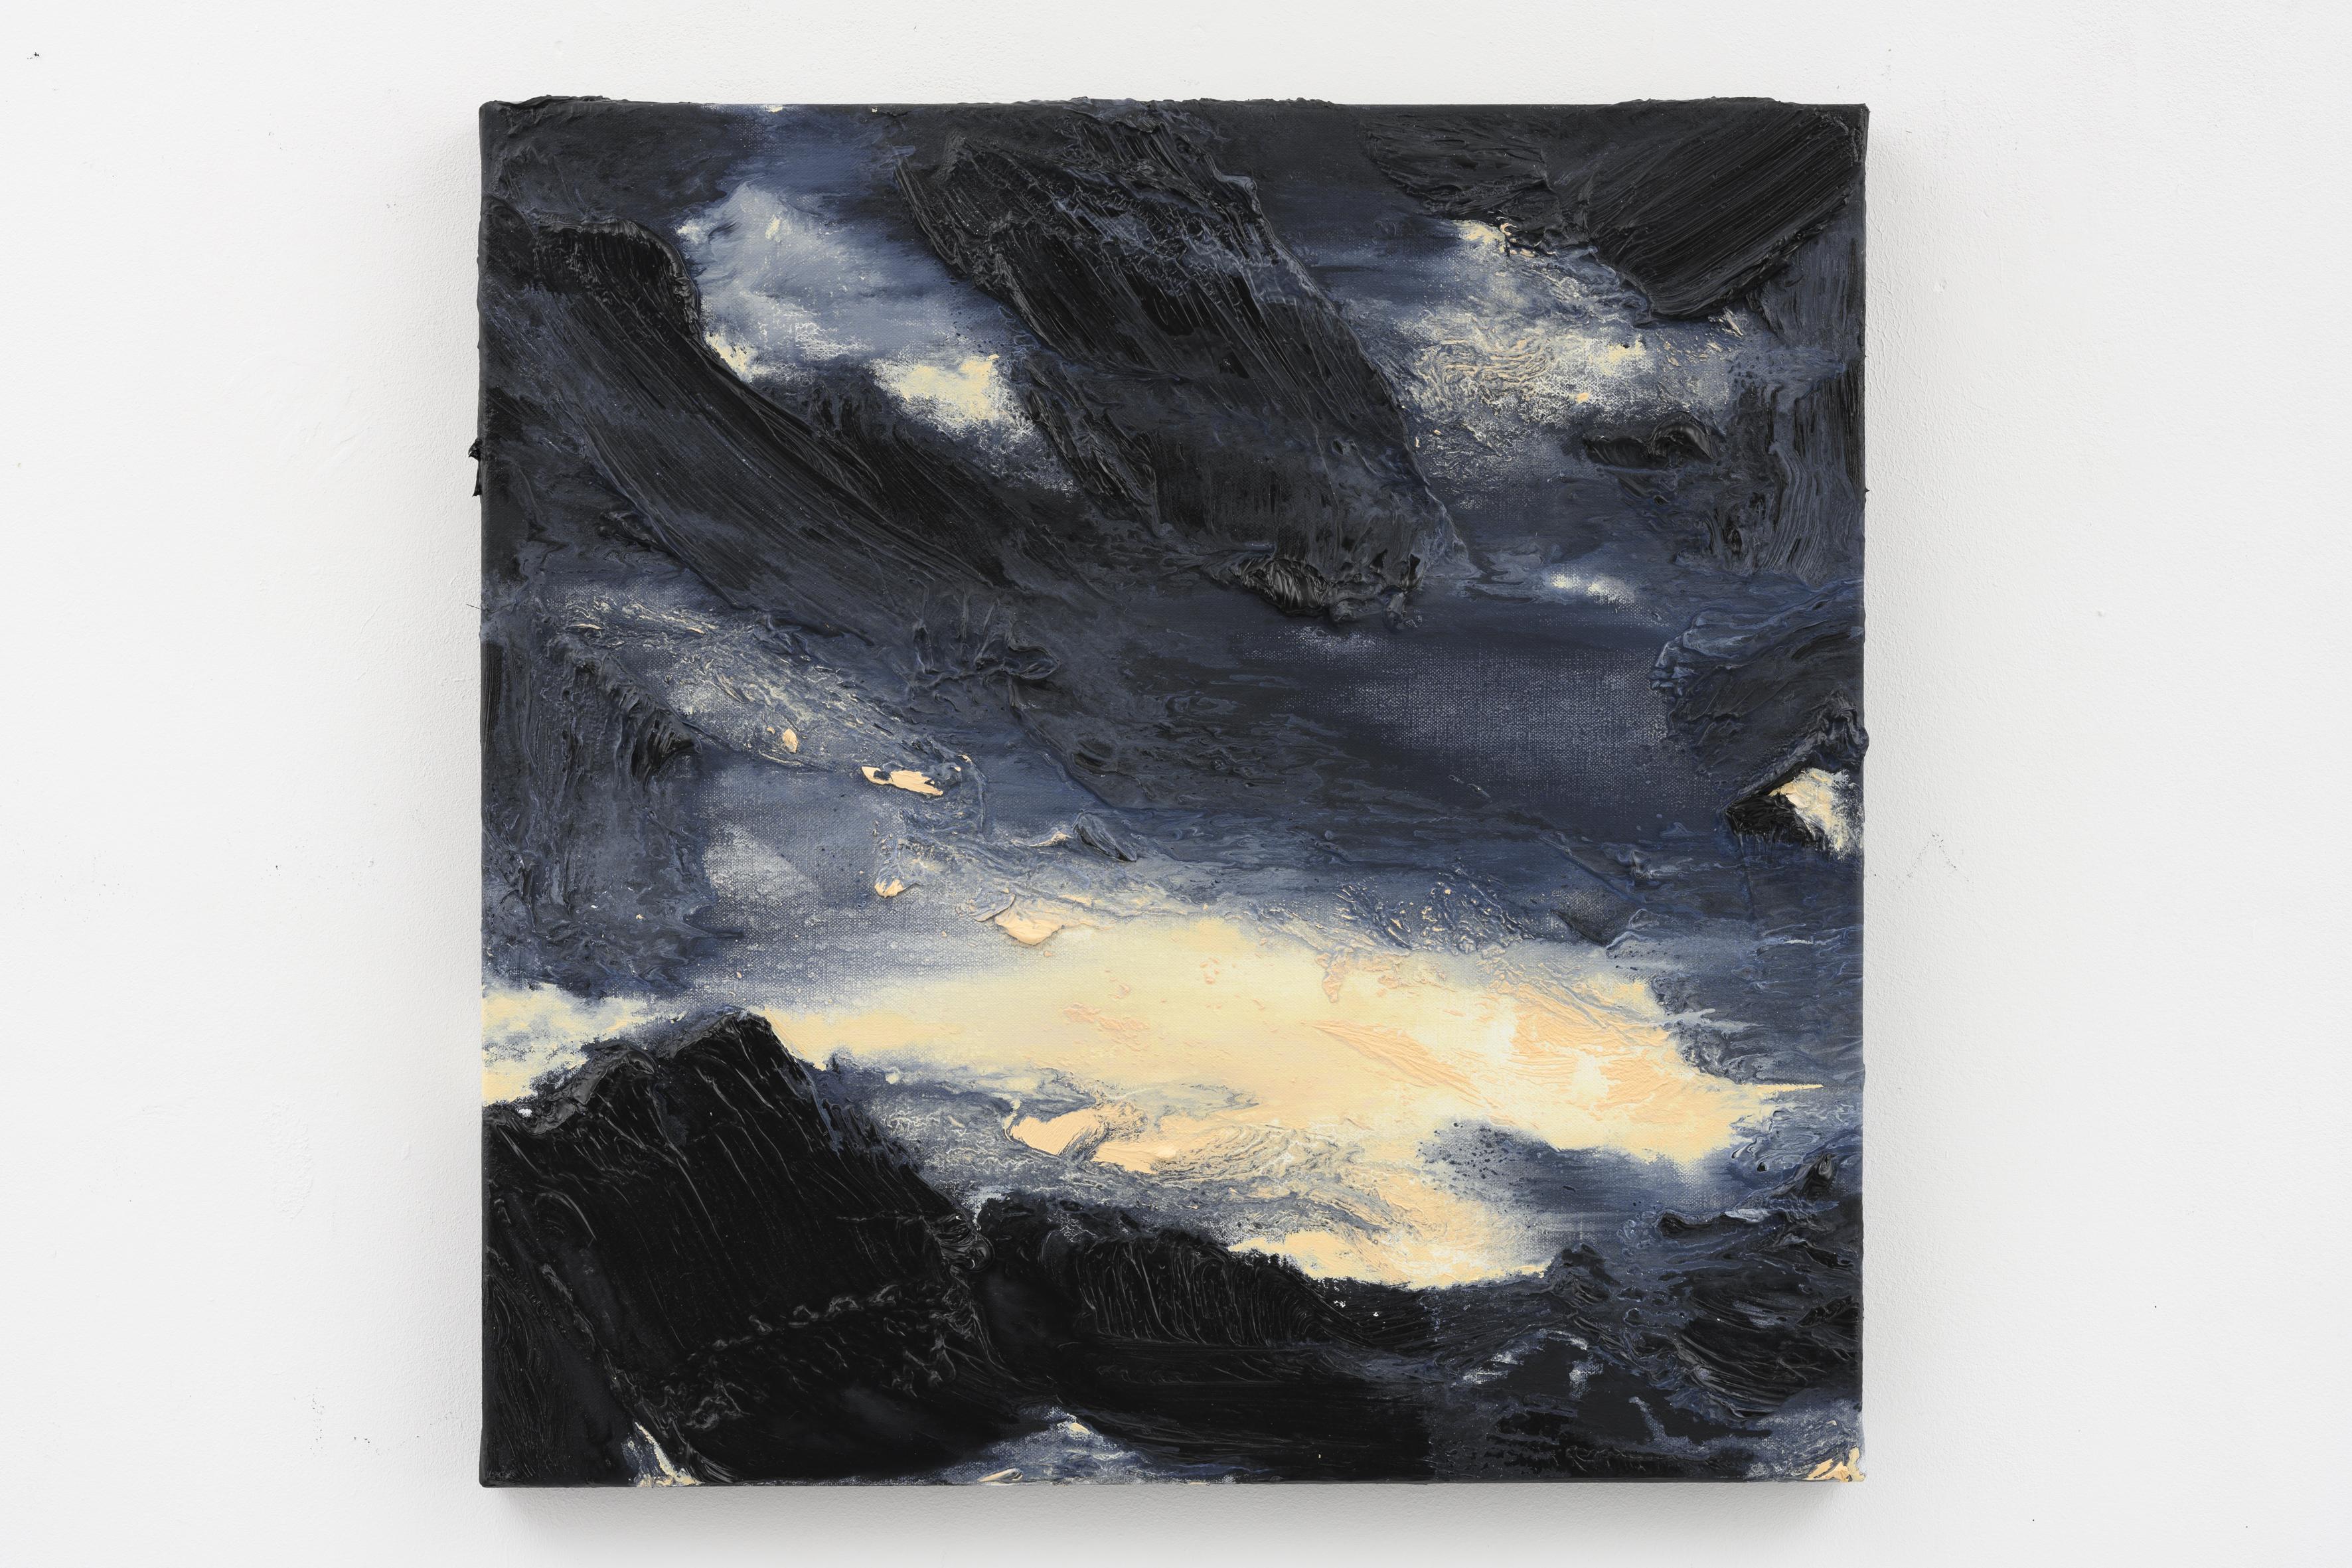 """Crepúsculo III"", 50 x 60 cm. oil on linen 2019 (Portugal)"